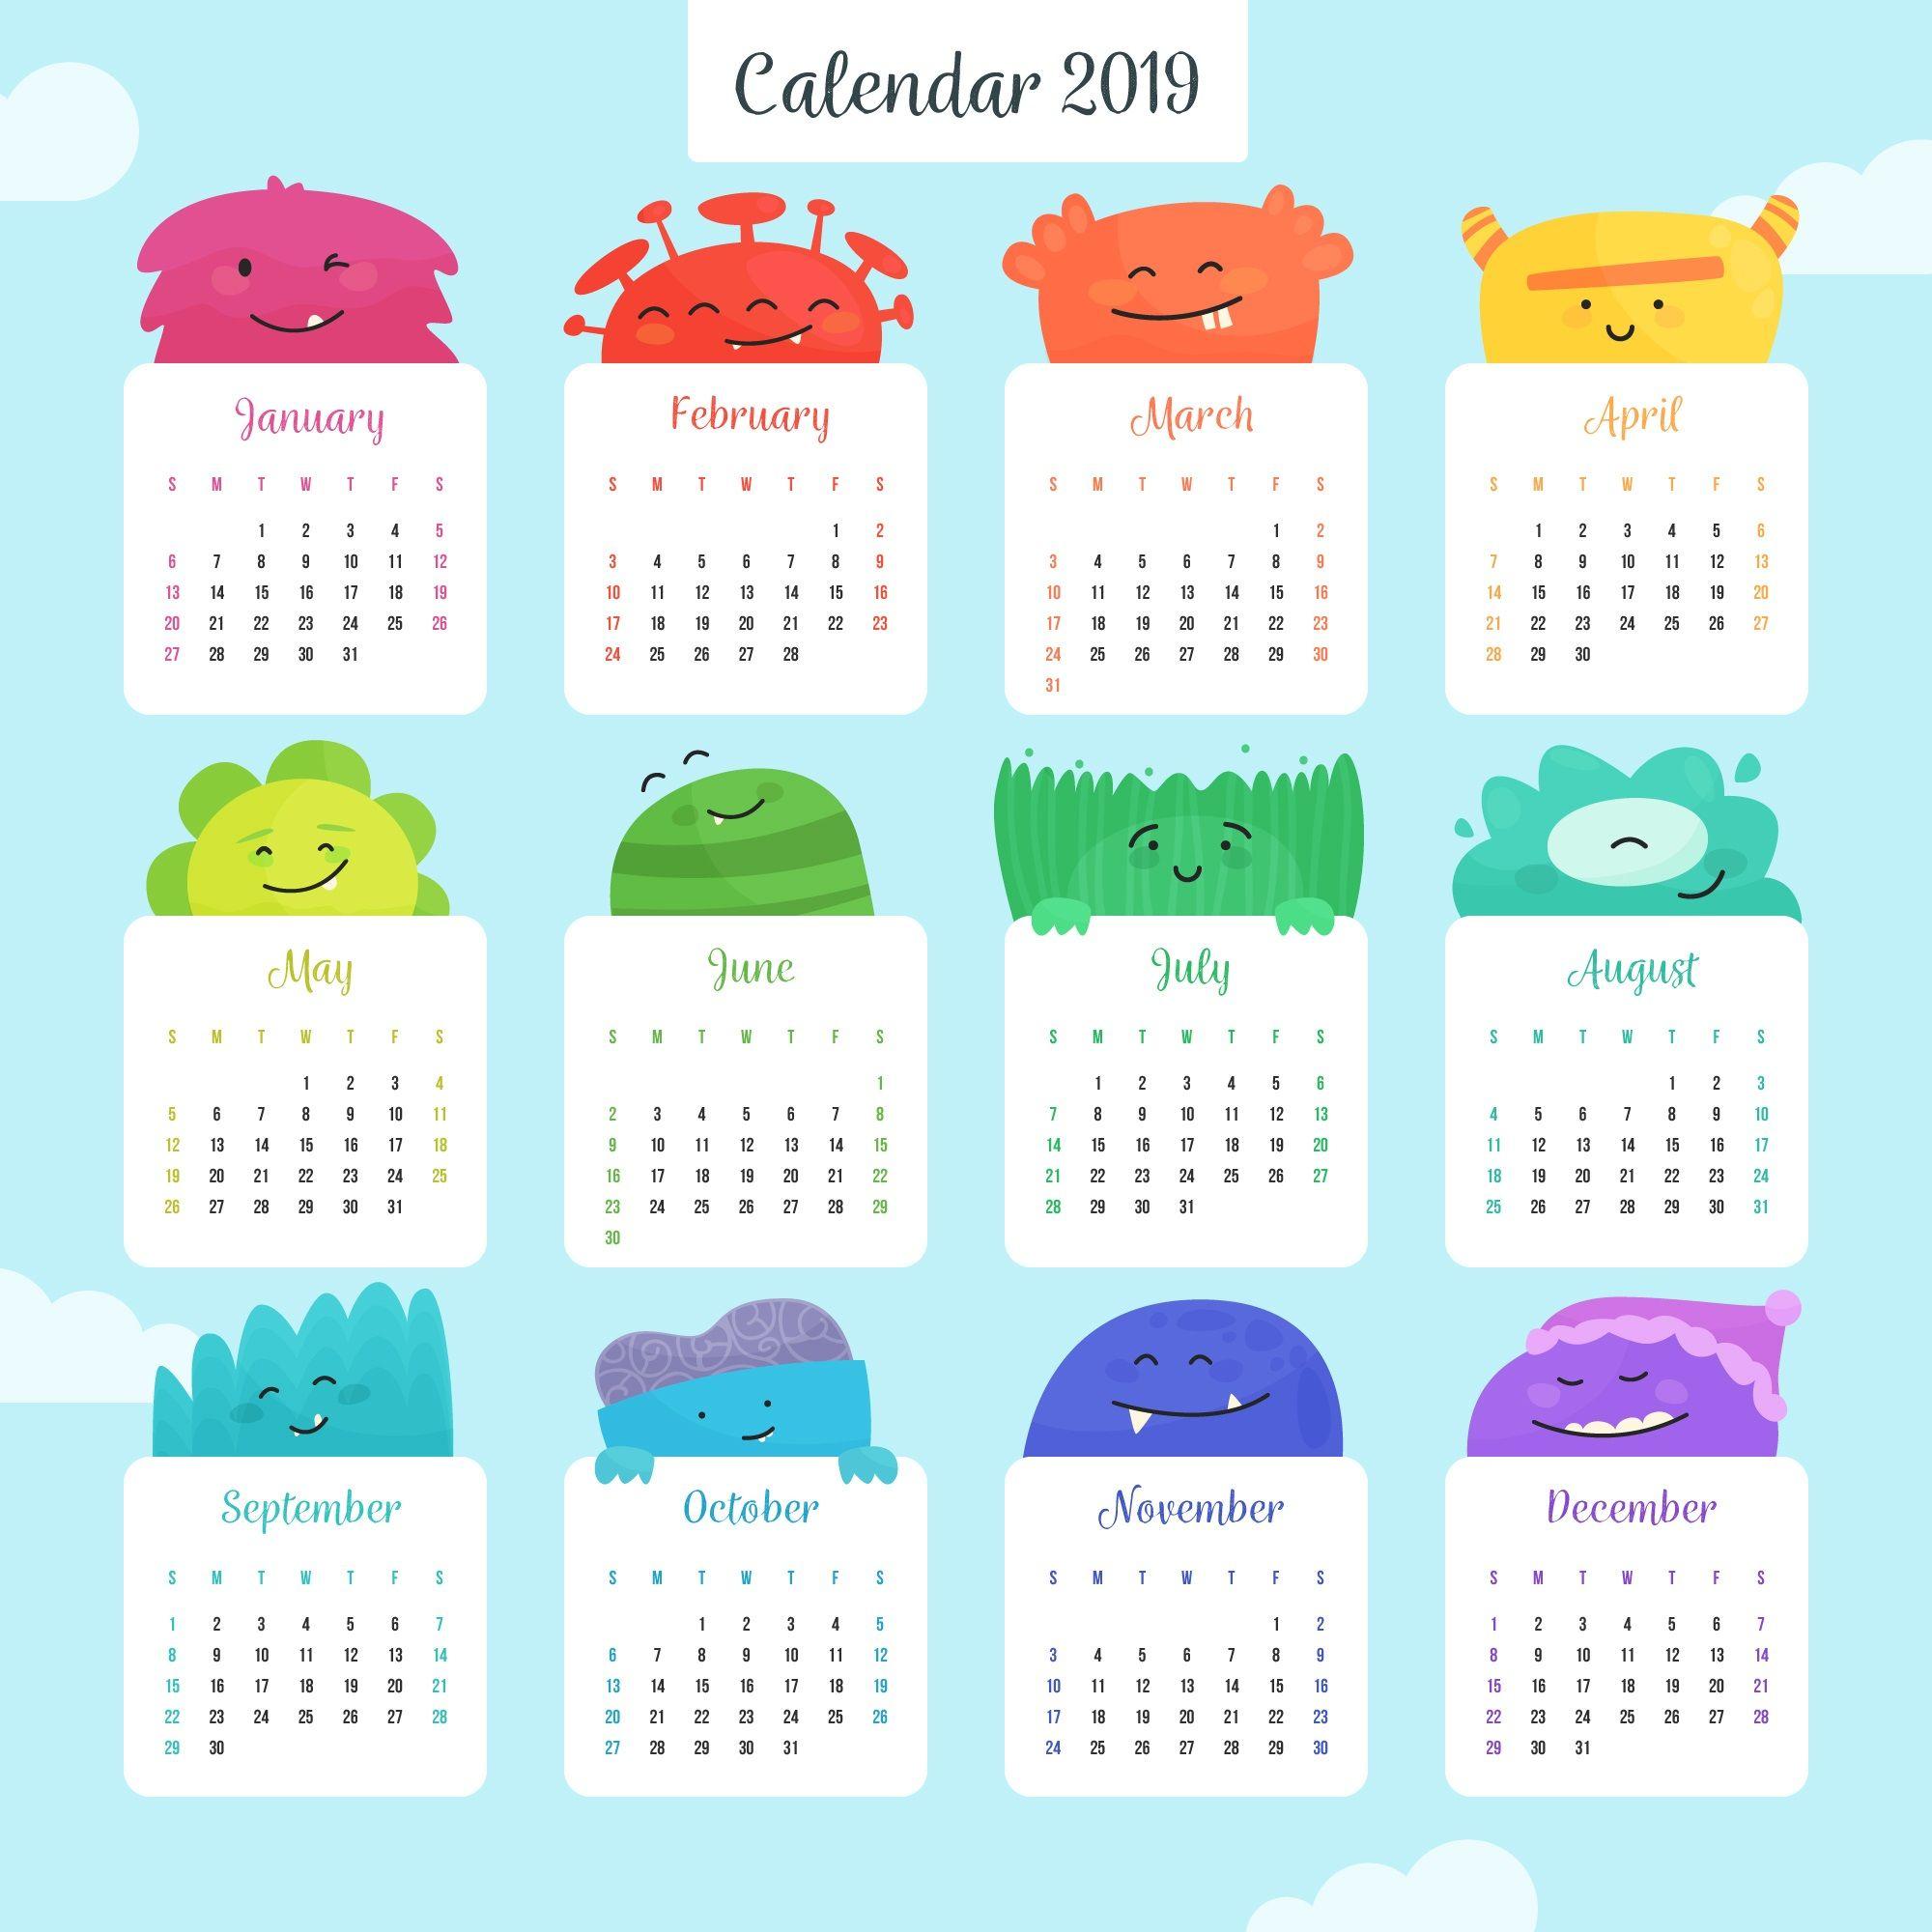 Colorful Calendar For The Year 2019 #2019Calendar #printablecalendar intended for Cute Yearly Calendar Template